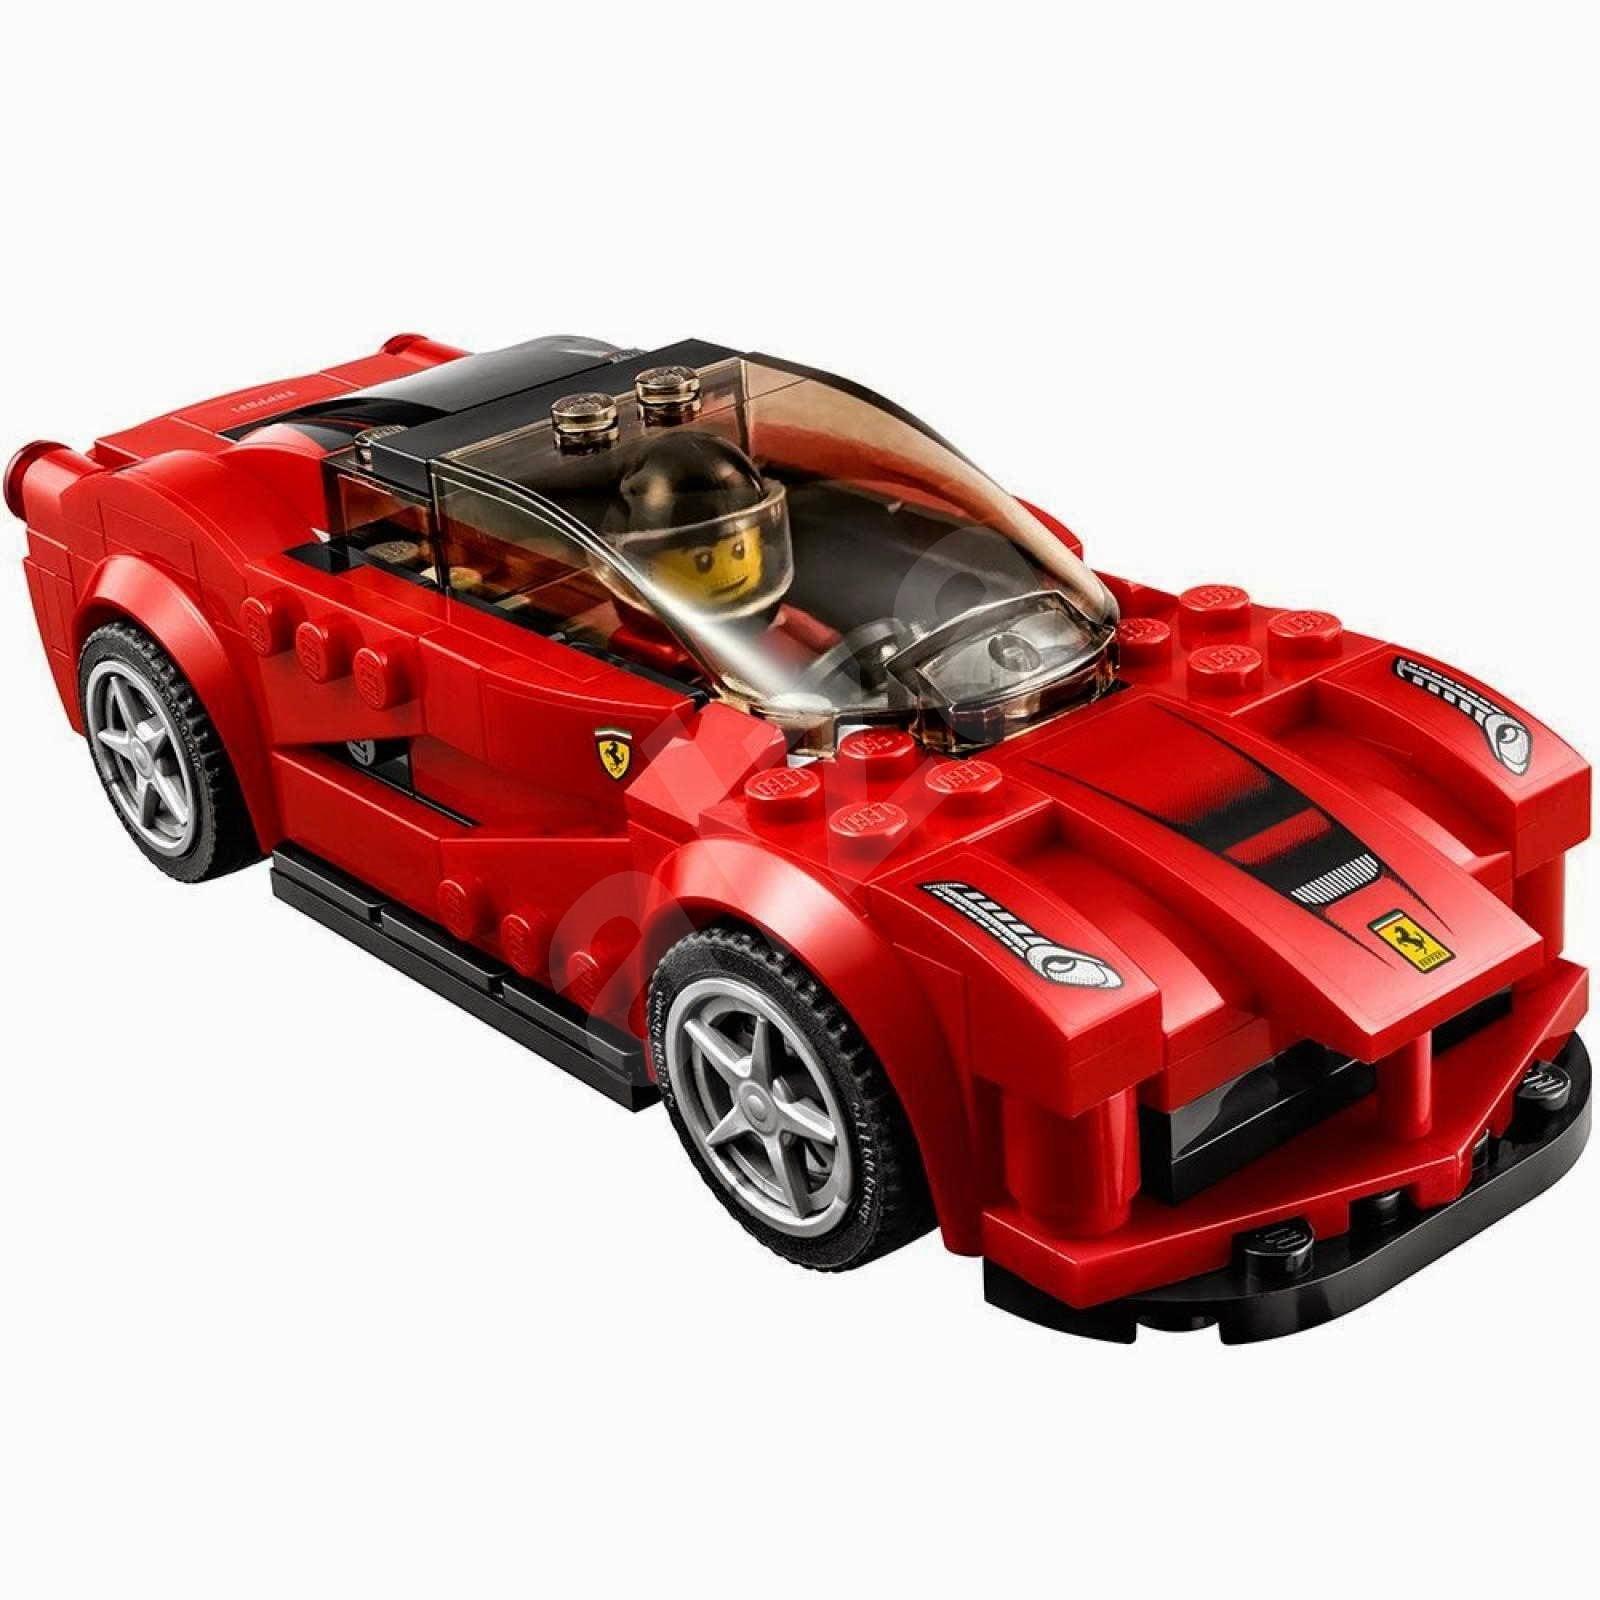 Lego Speed Champions 75899 Laferrari Building Kit